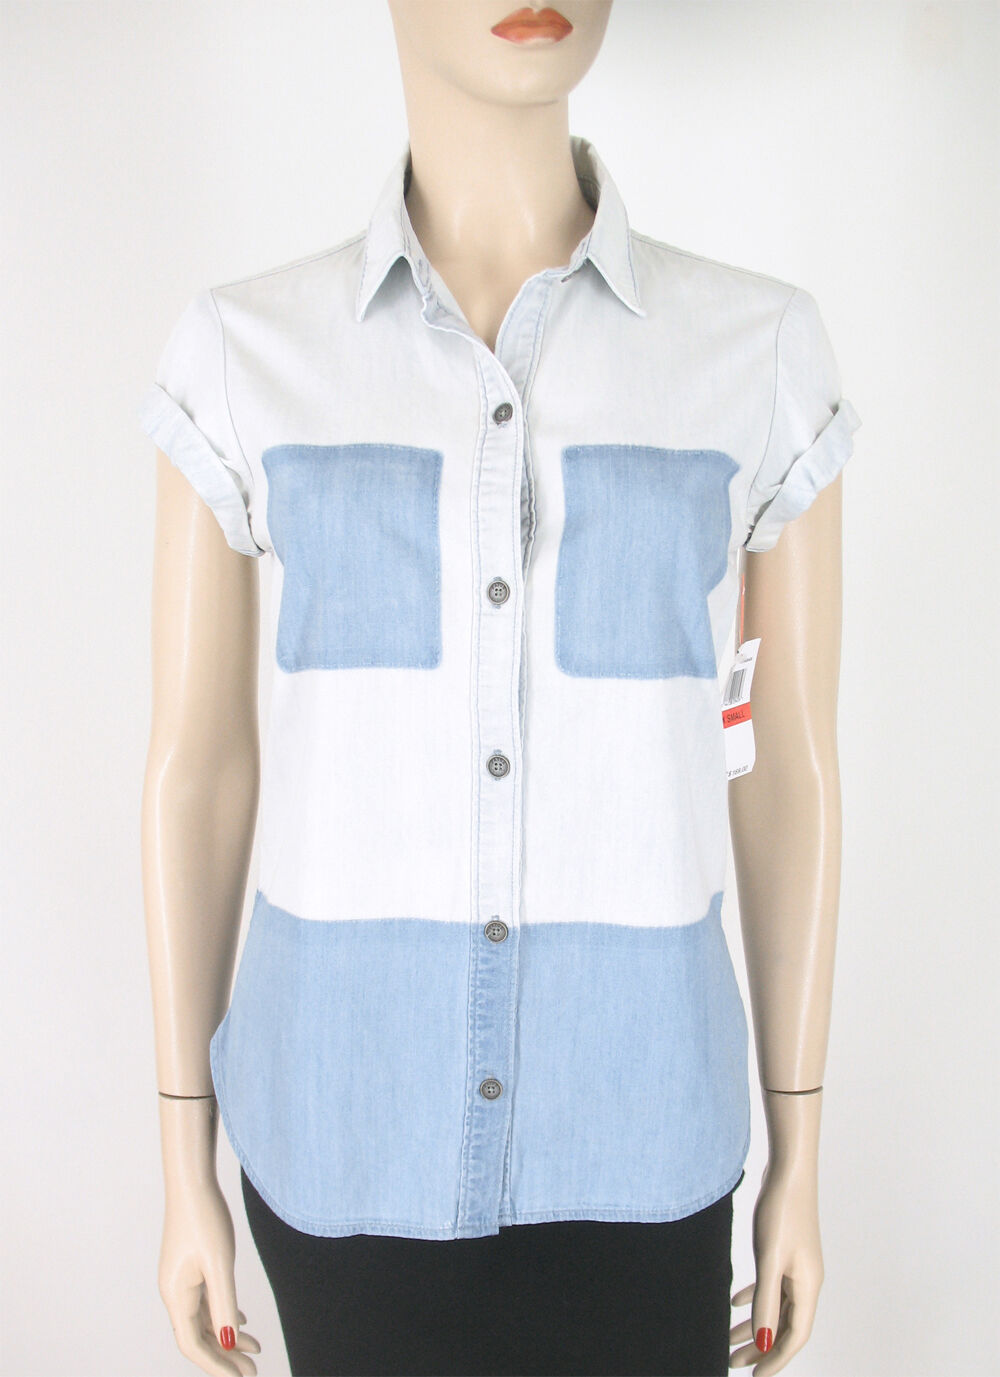 Paige Amelia Two Tone Denim Shirt Top Faded Blau XS  9753 BM14